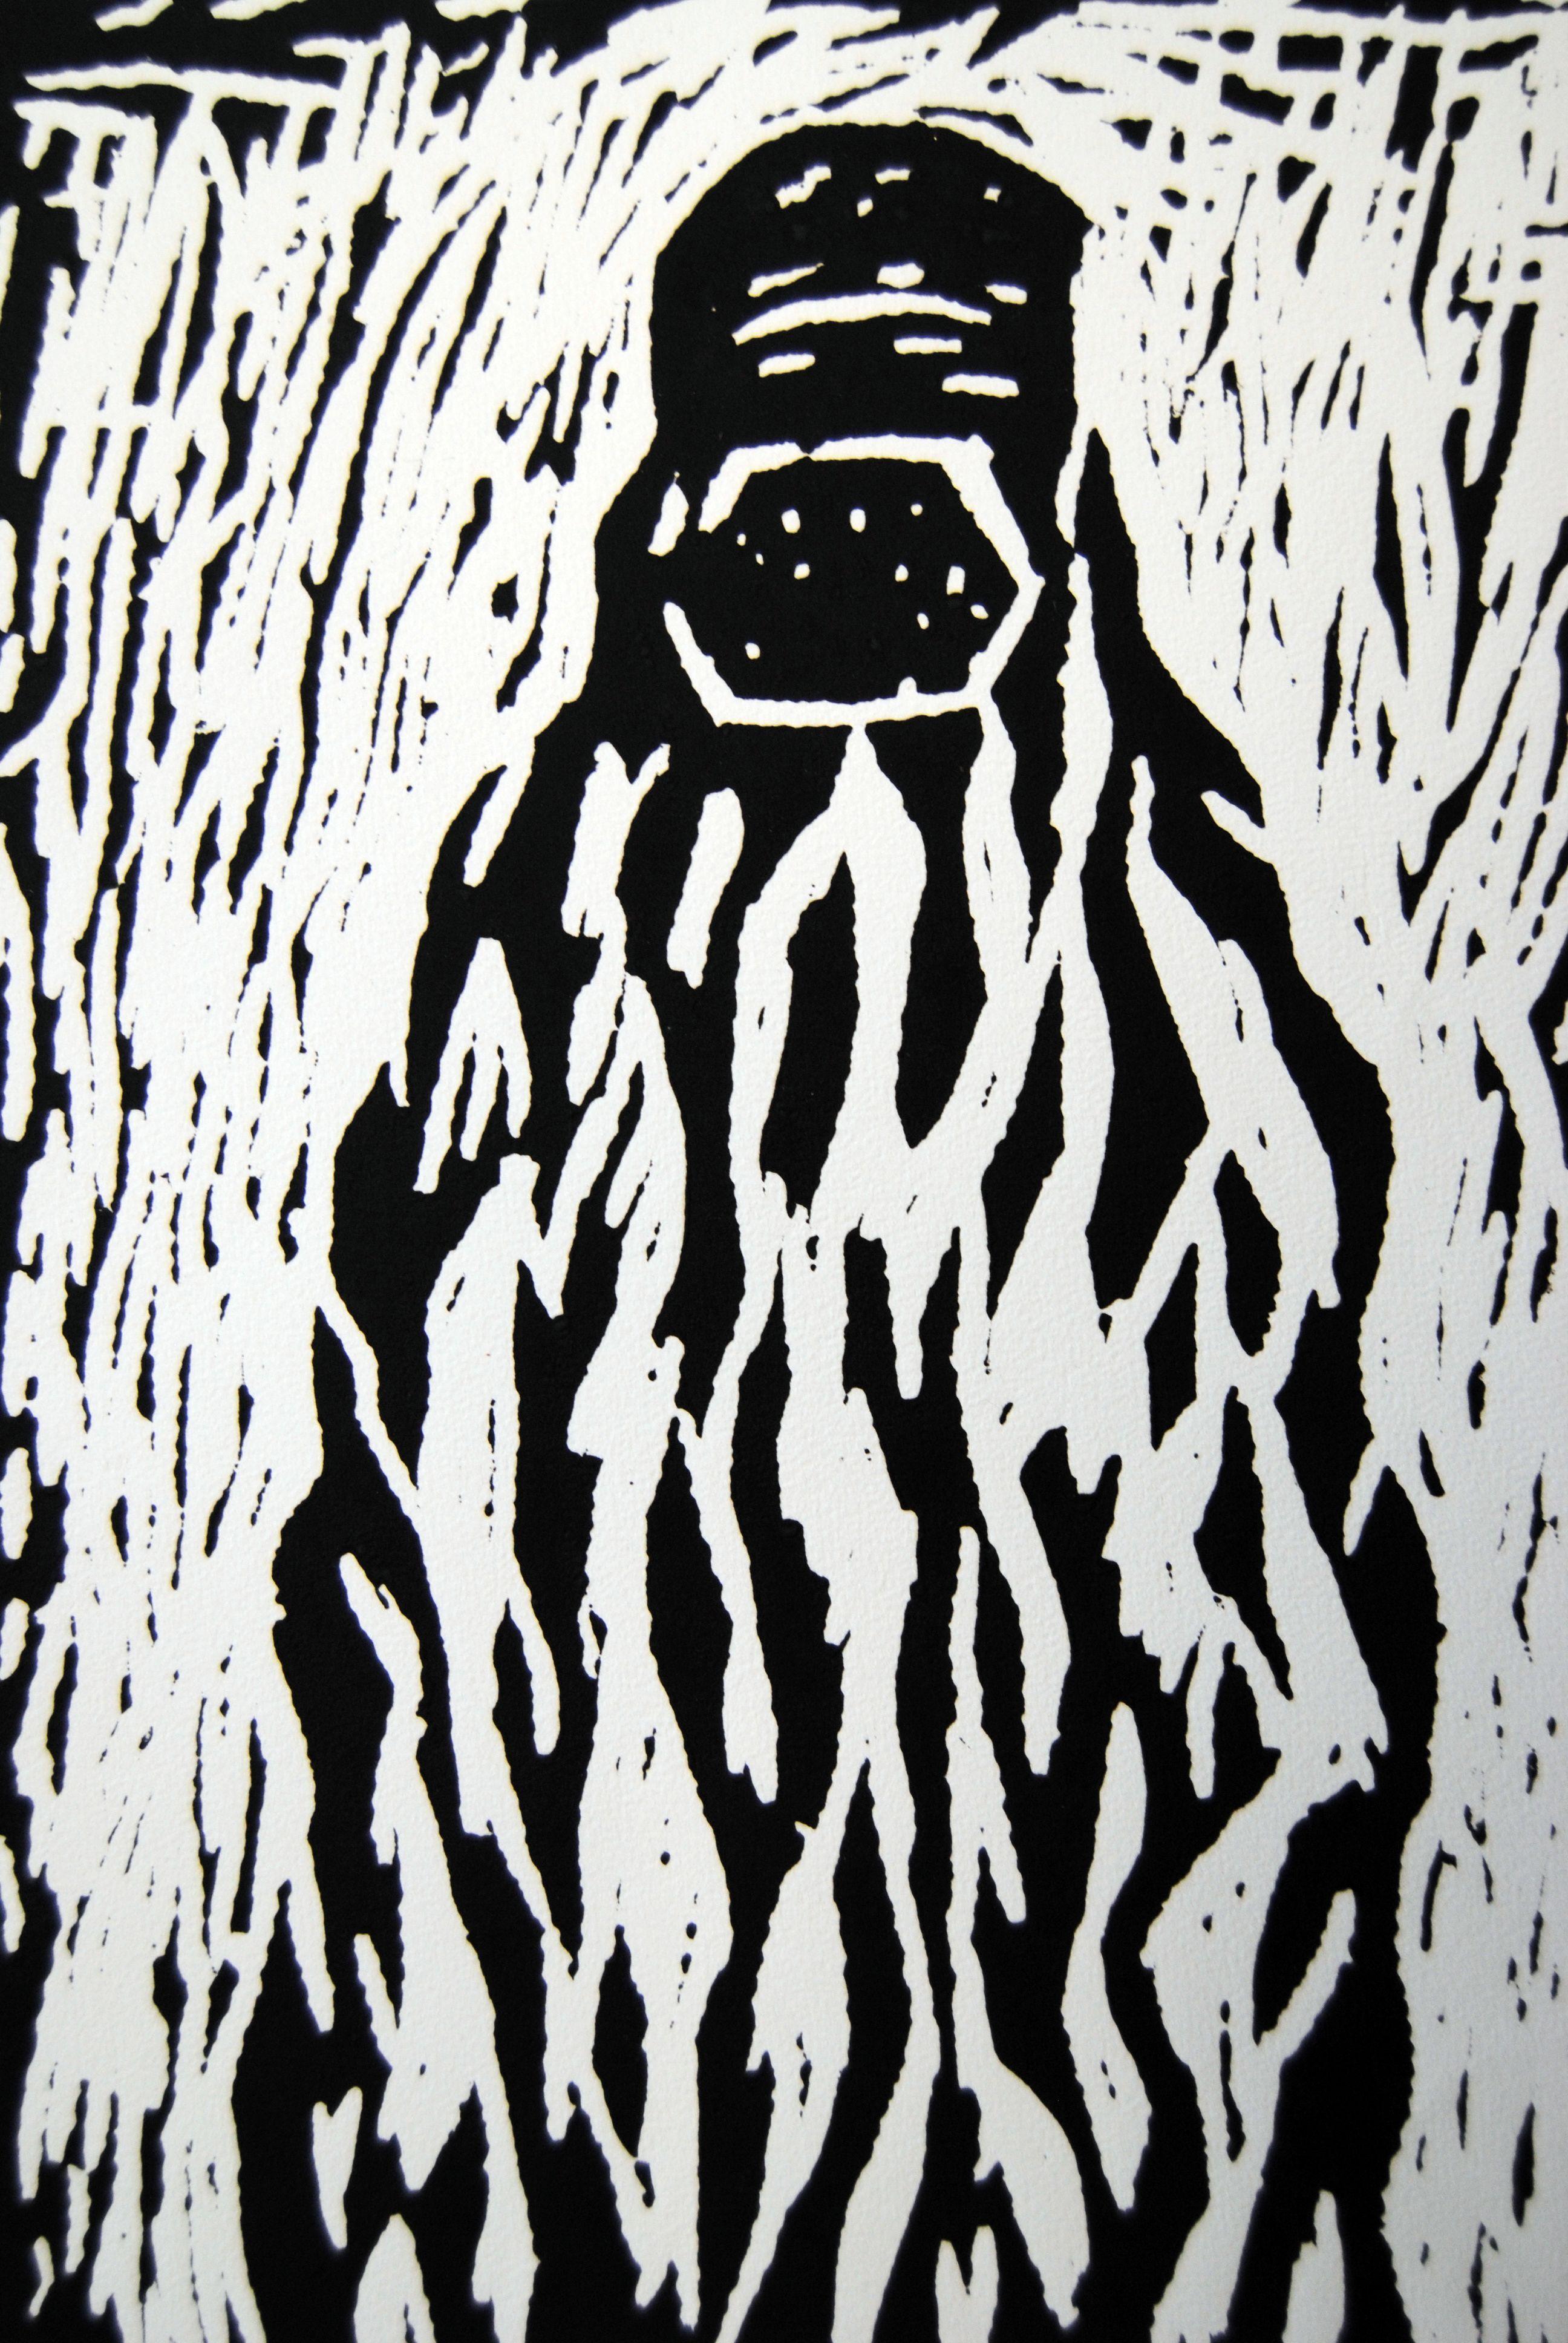 Afghanische Frau I, 2008, Linolschnitt